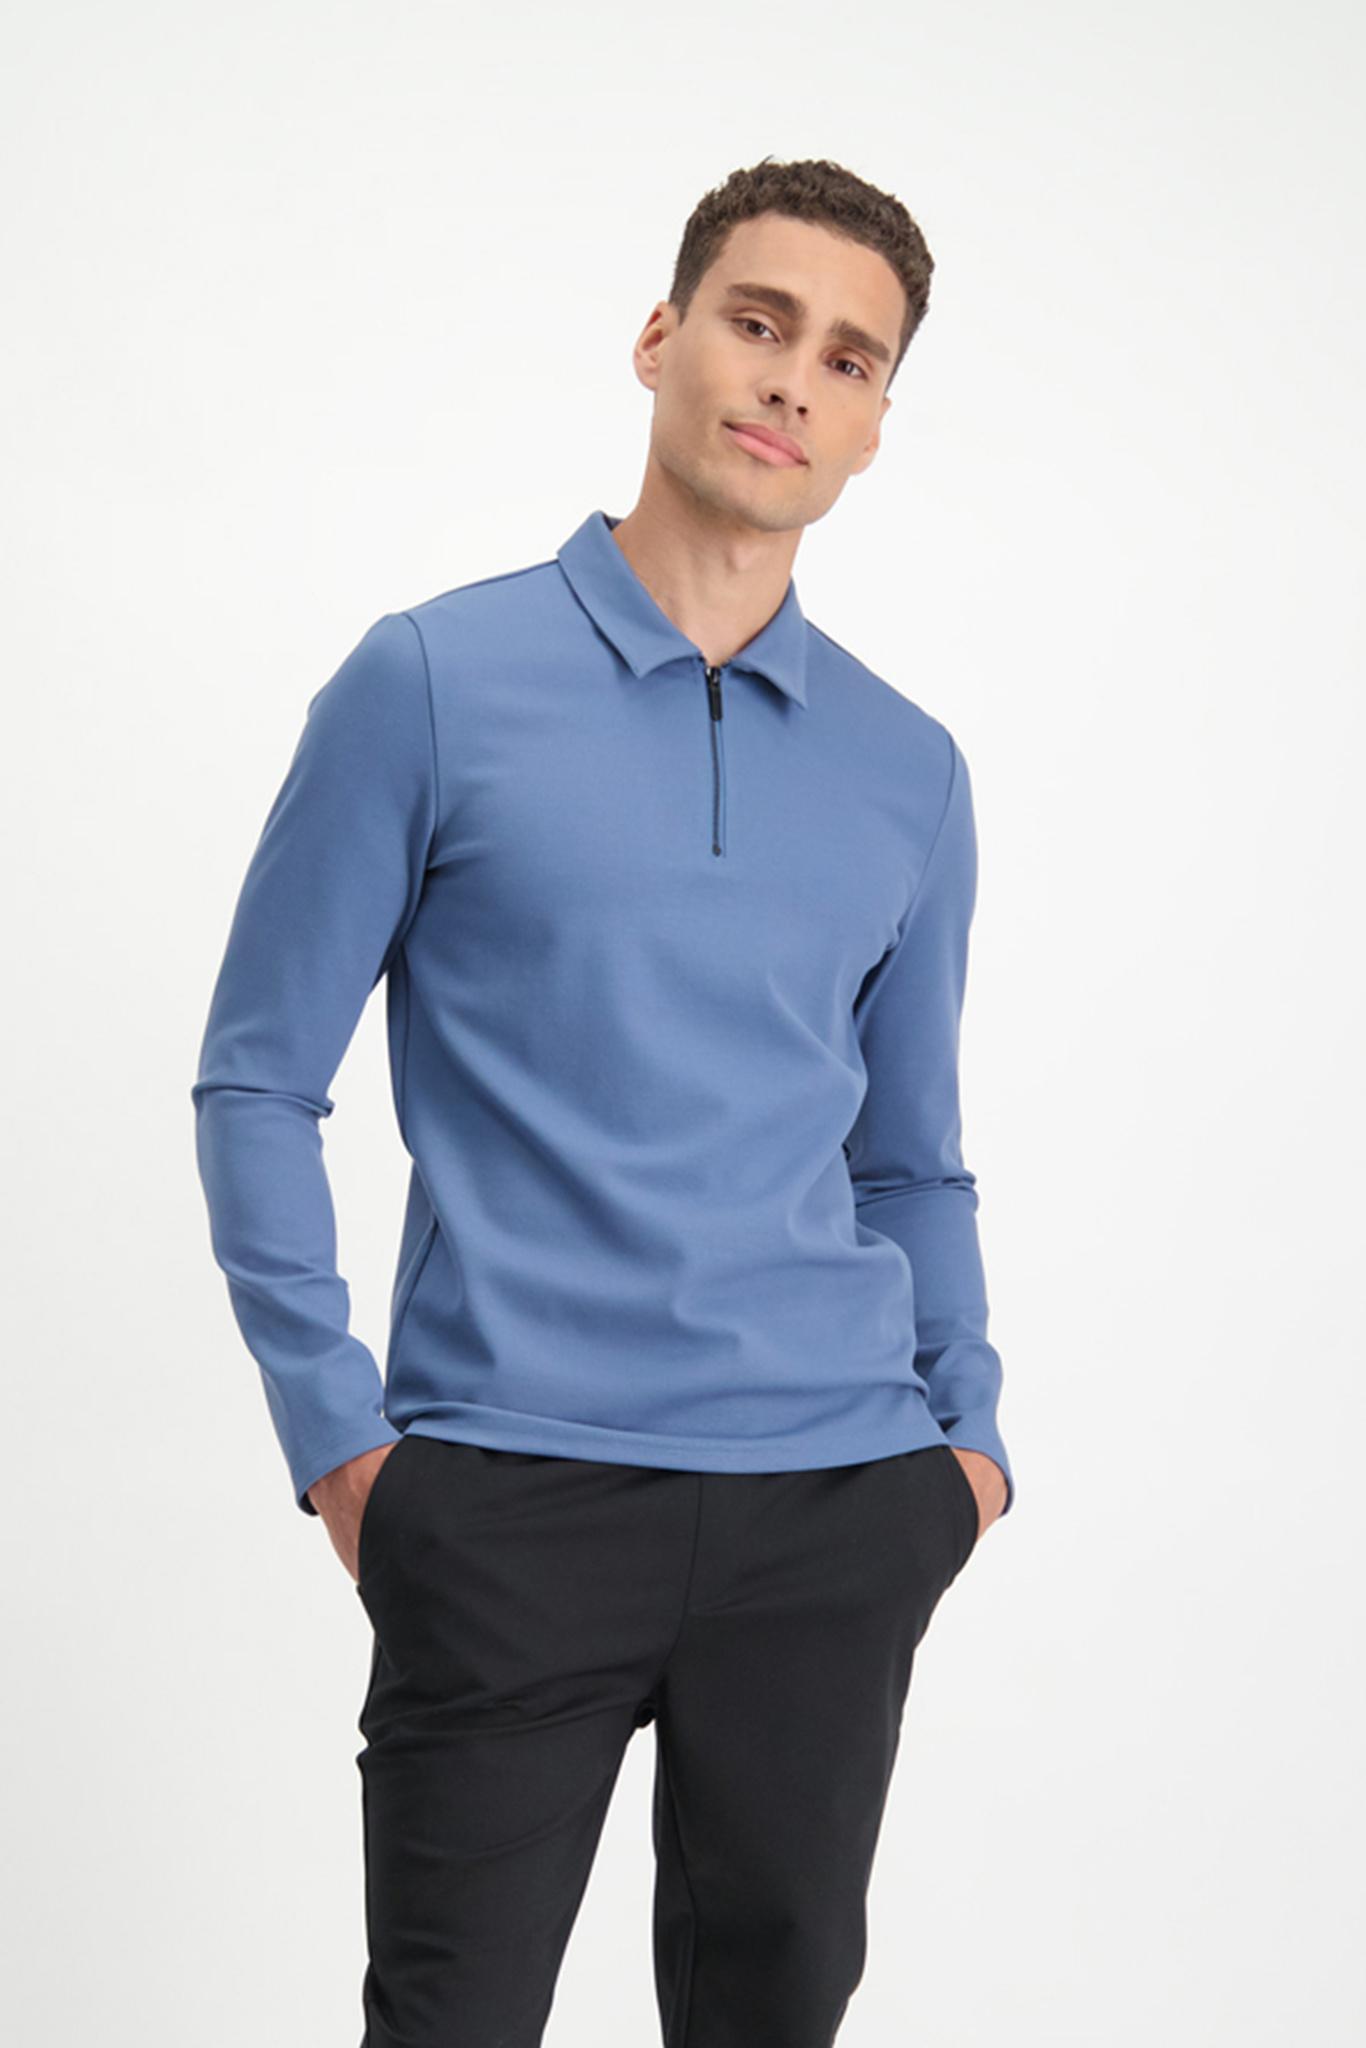 Lofty Manner Blue Sweater Mano